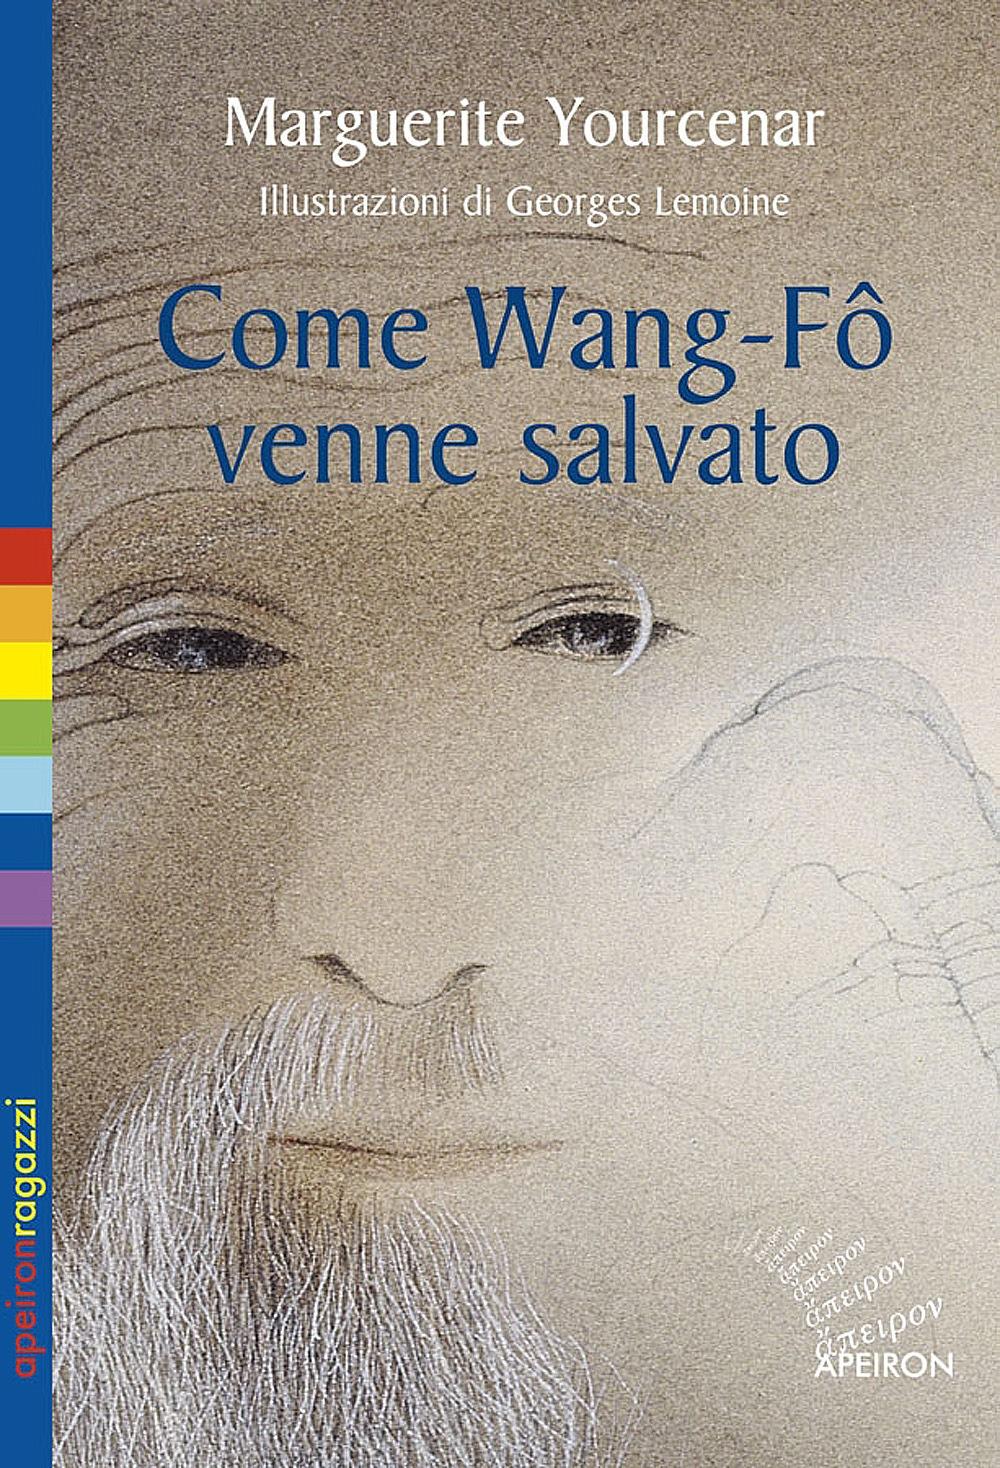 Come Wang-Fô venne salvato